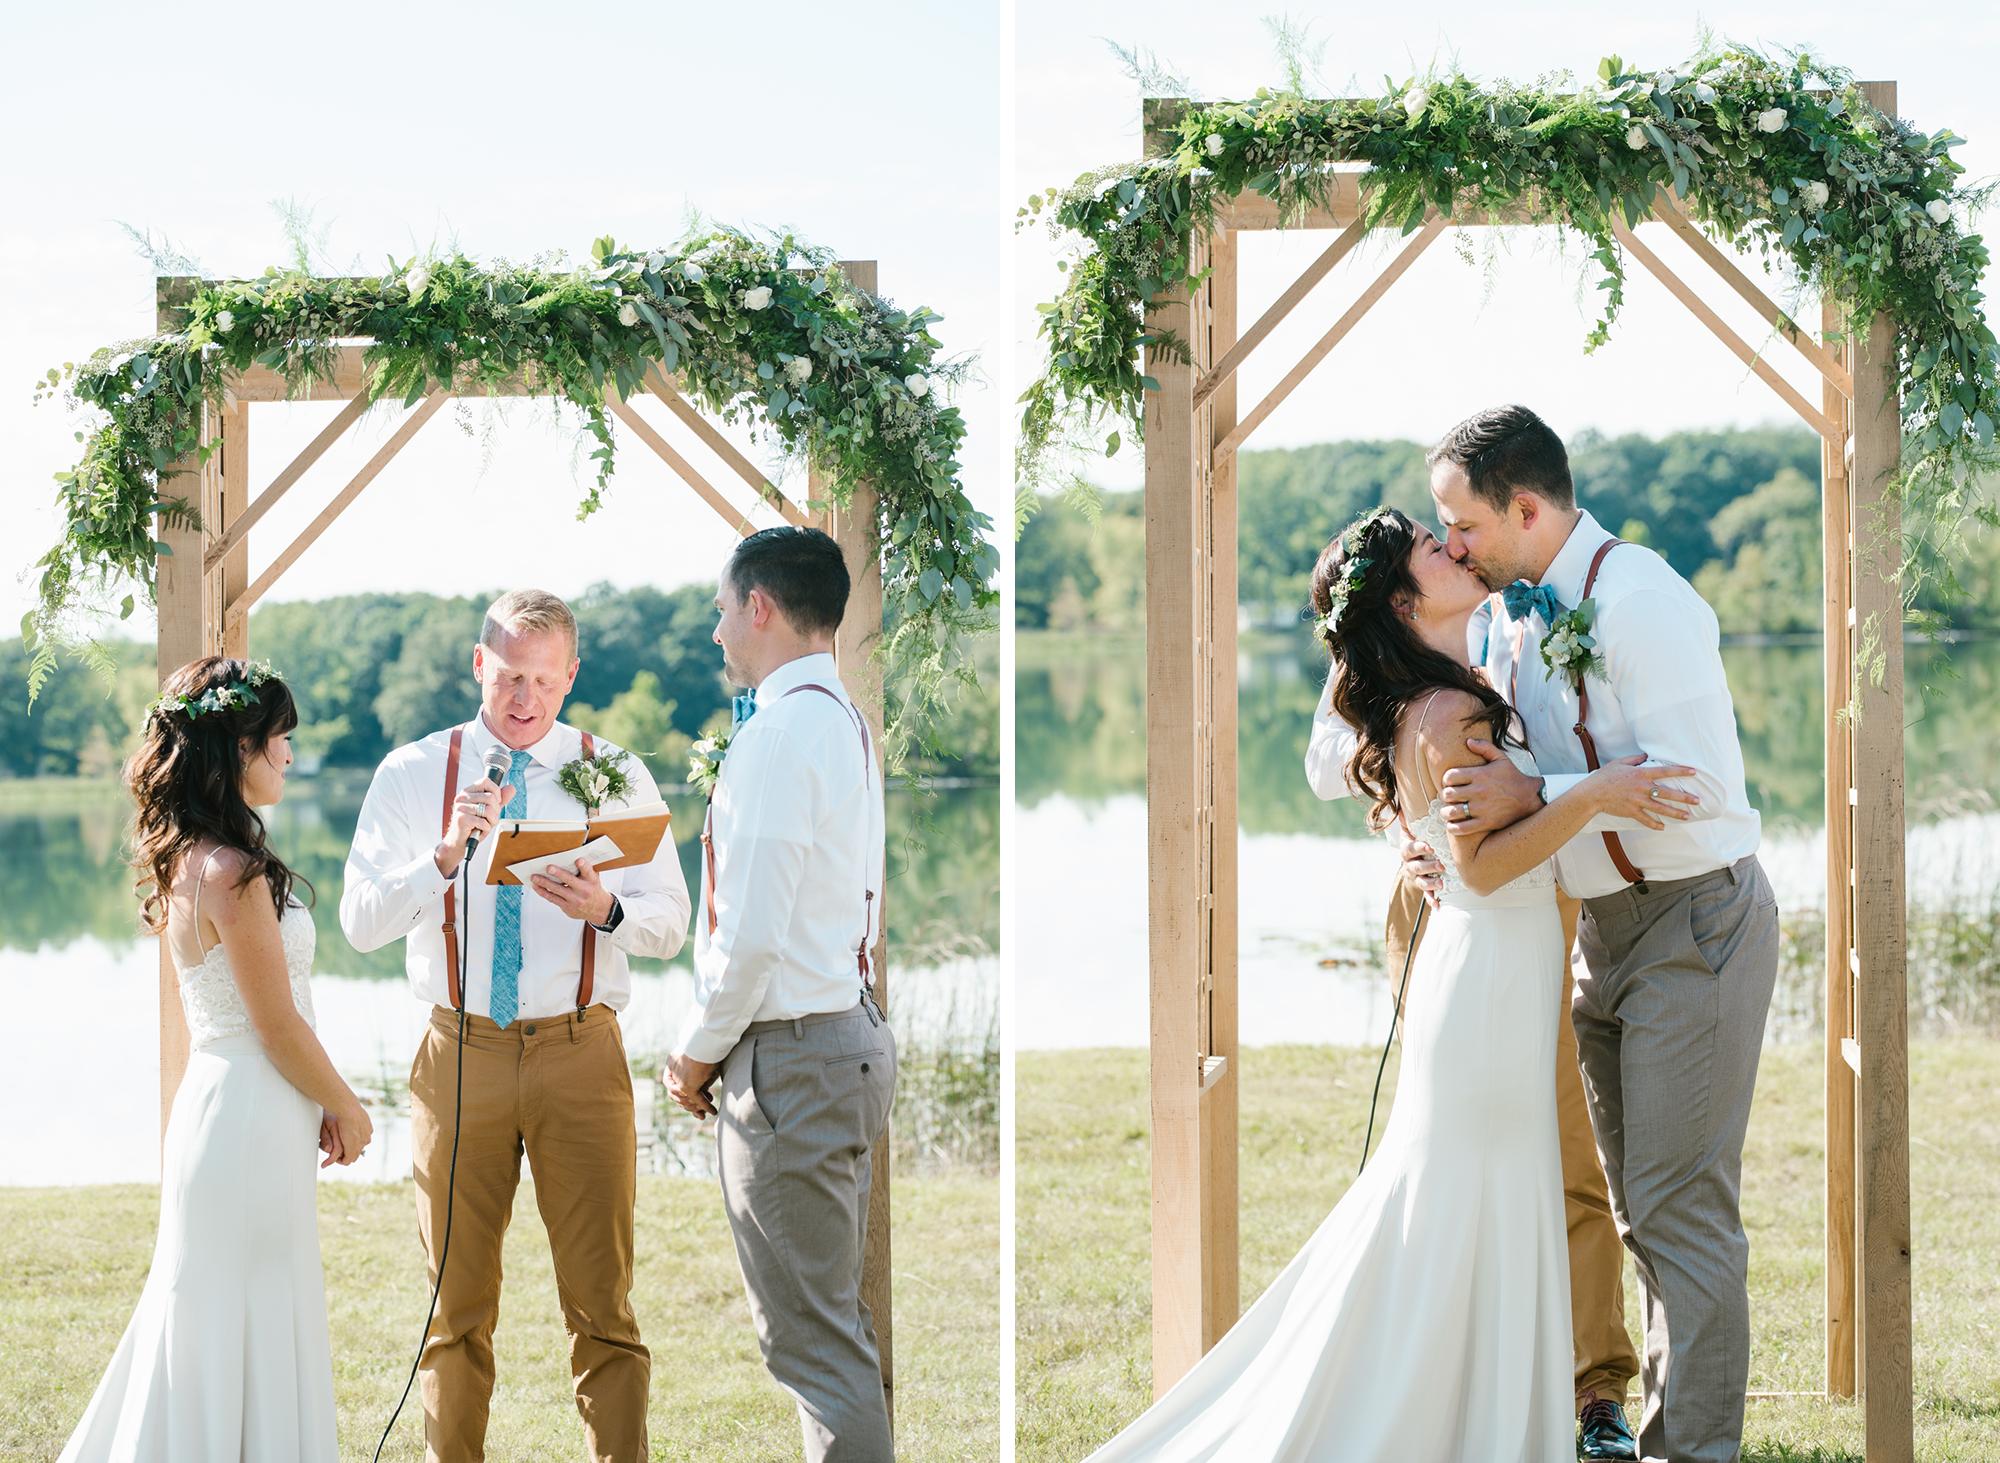 first-kiss-michigan-wedding-photographer-sydney-marie.png